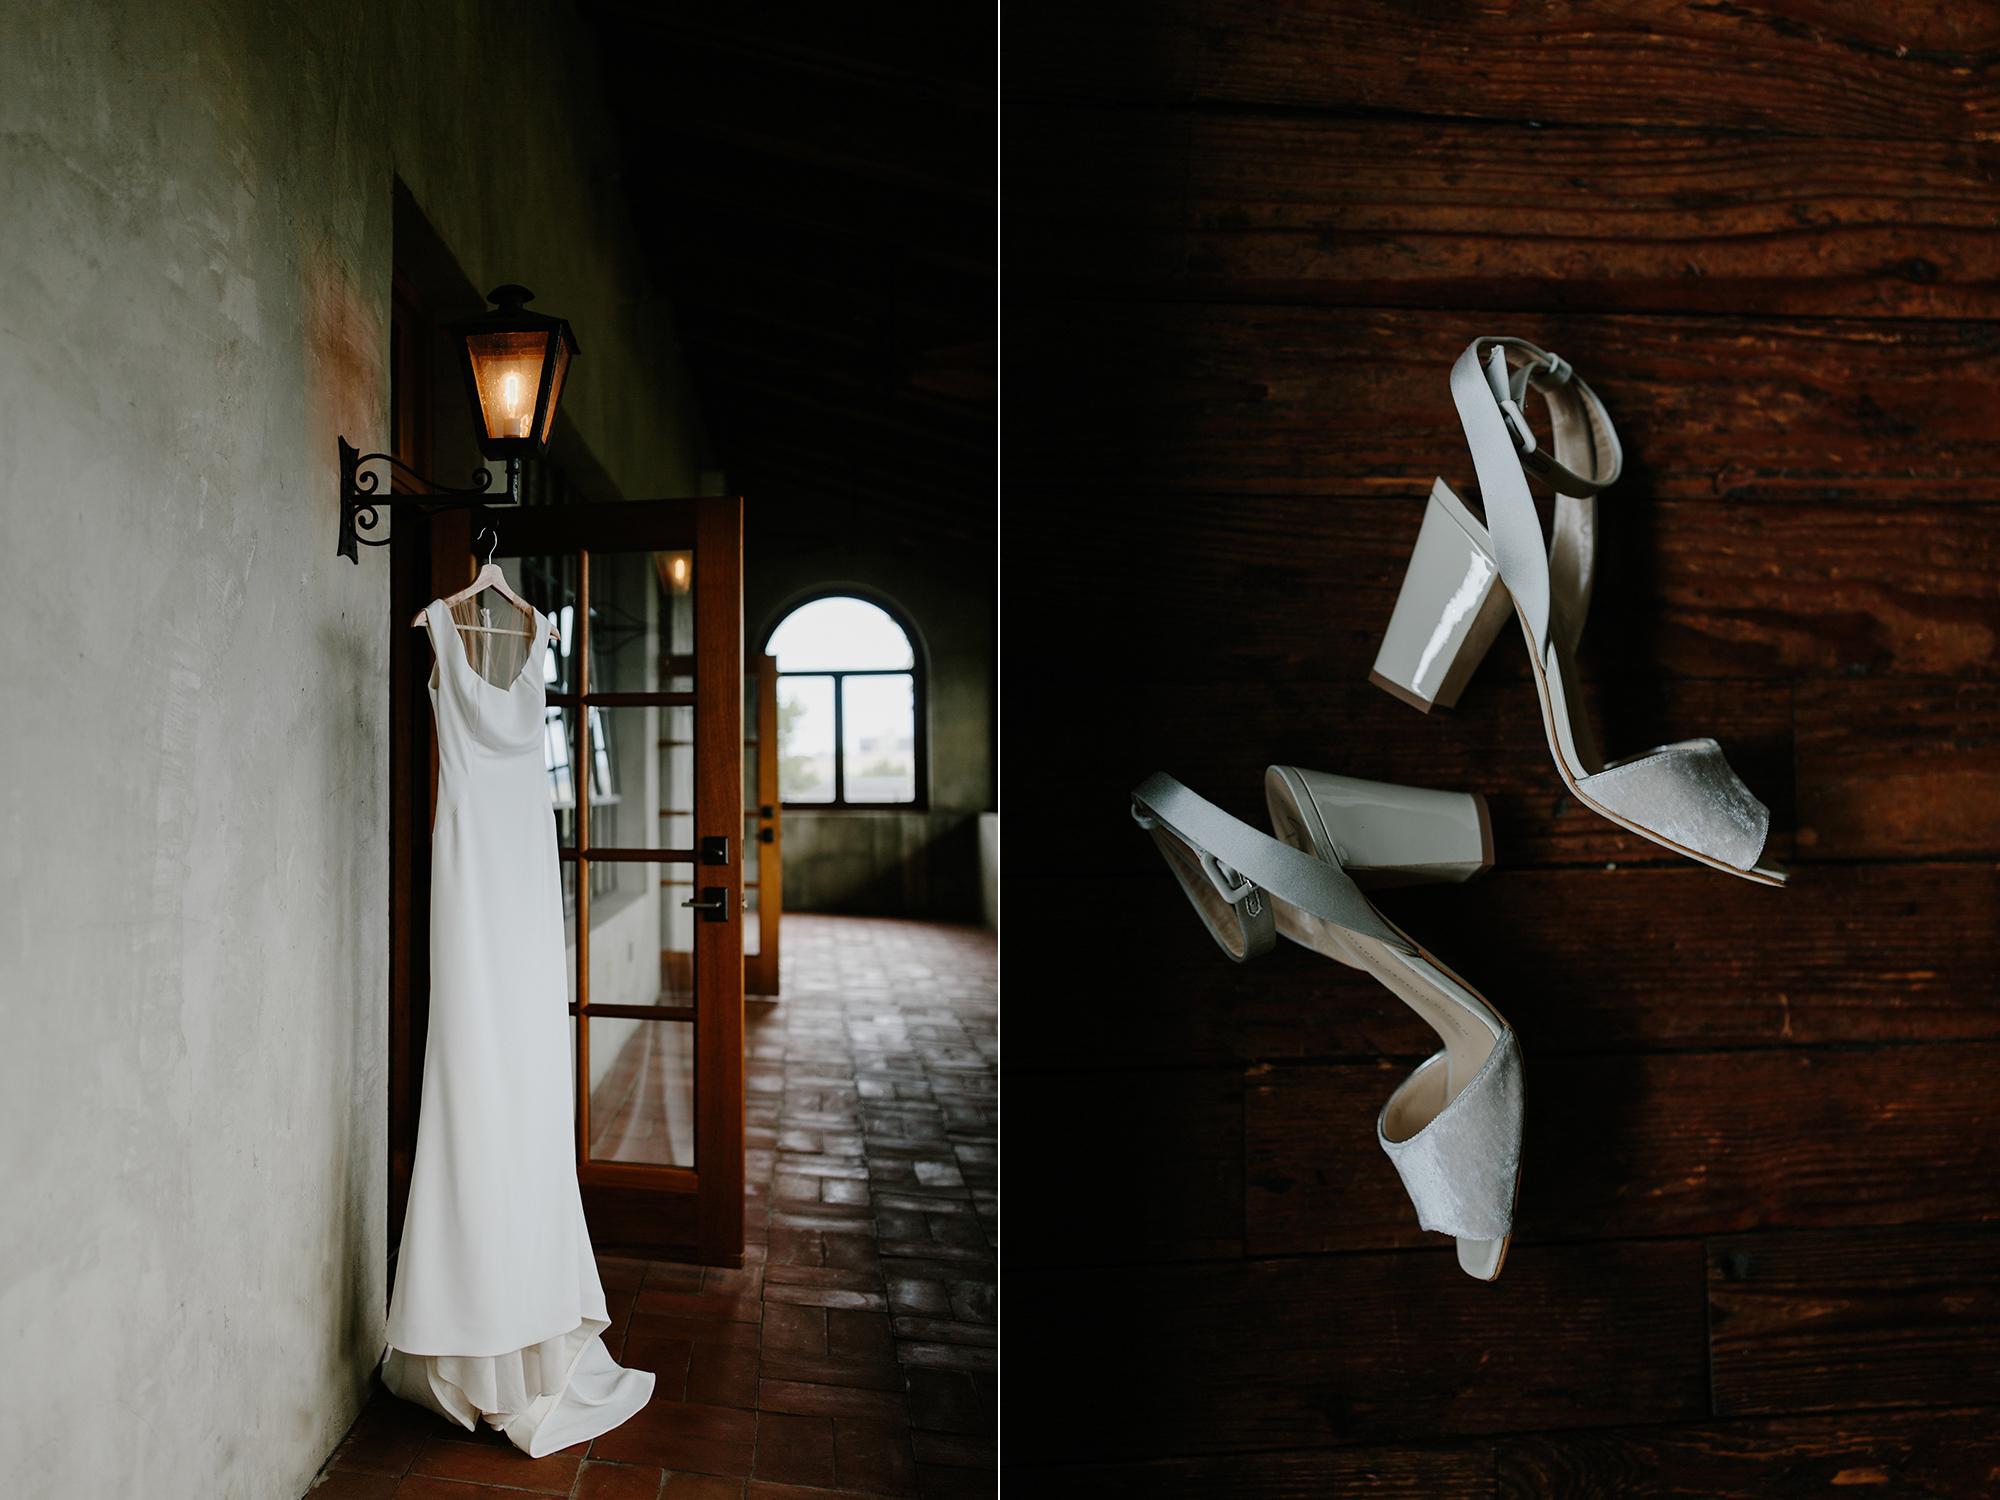 summerour-studio-wedding-photography-1.jpg